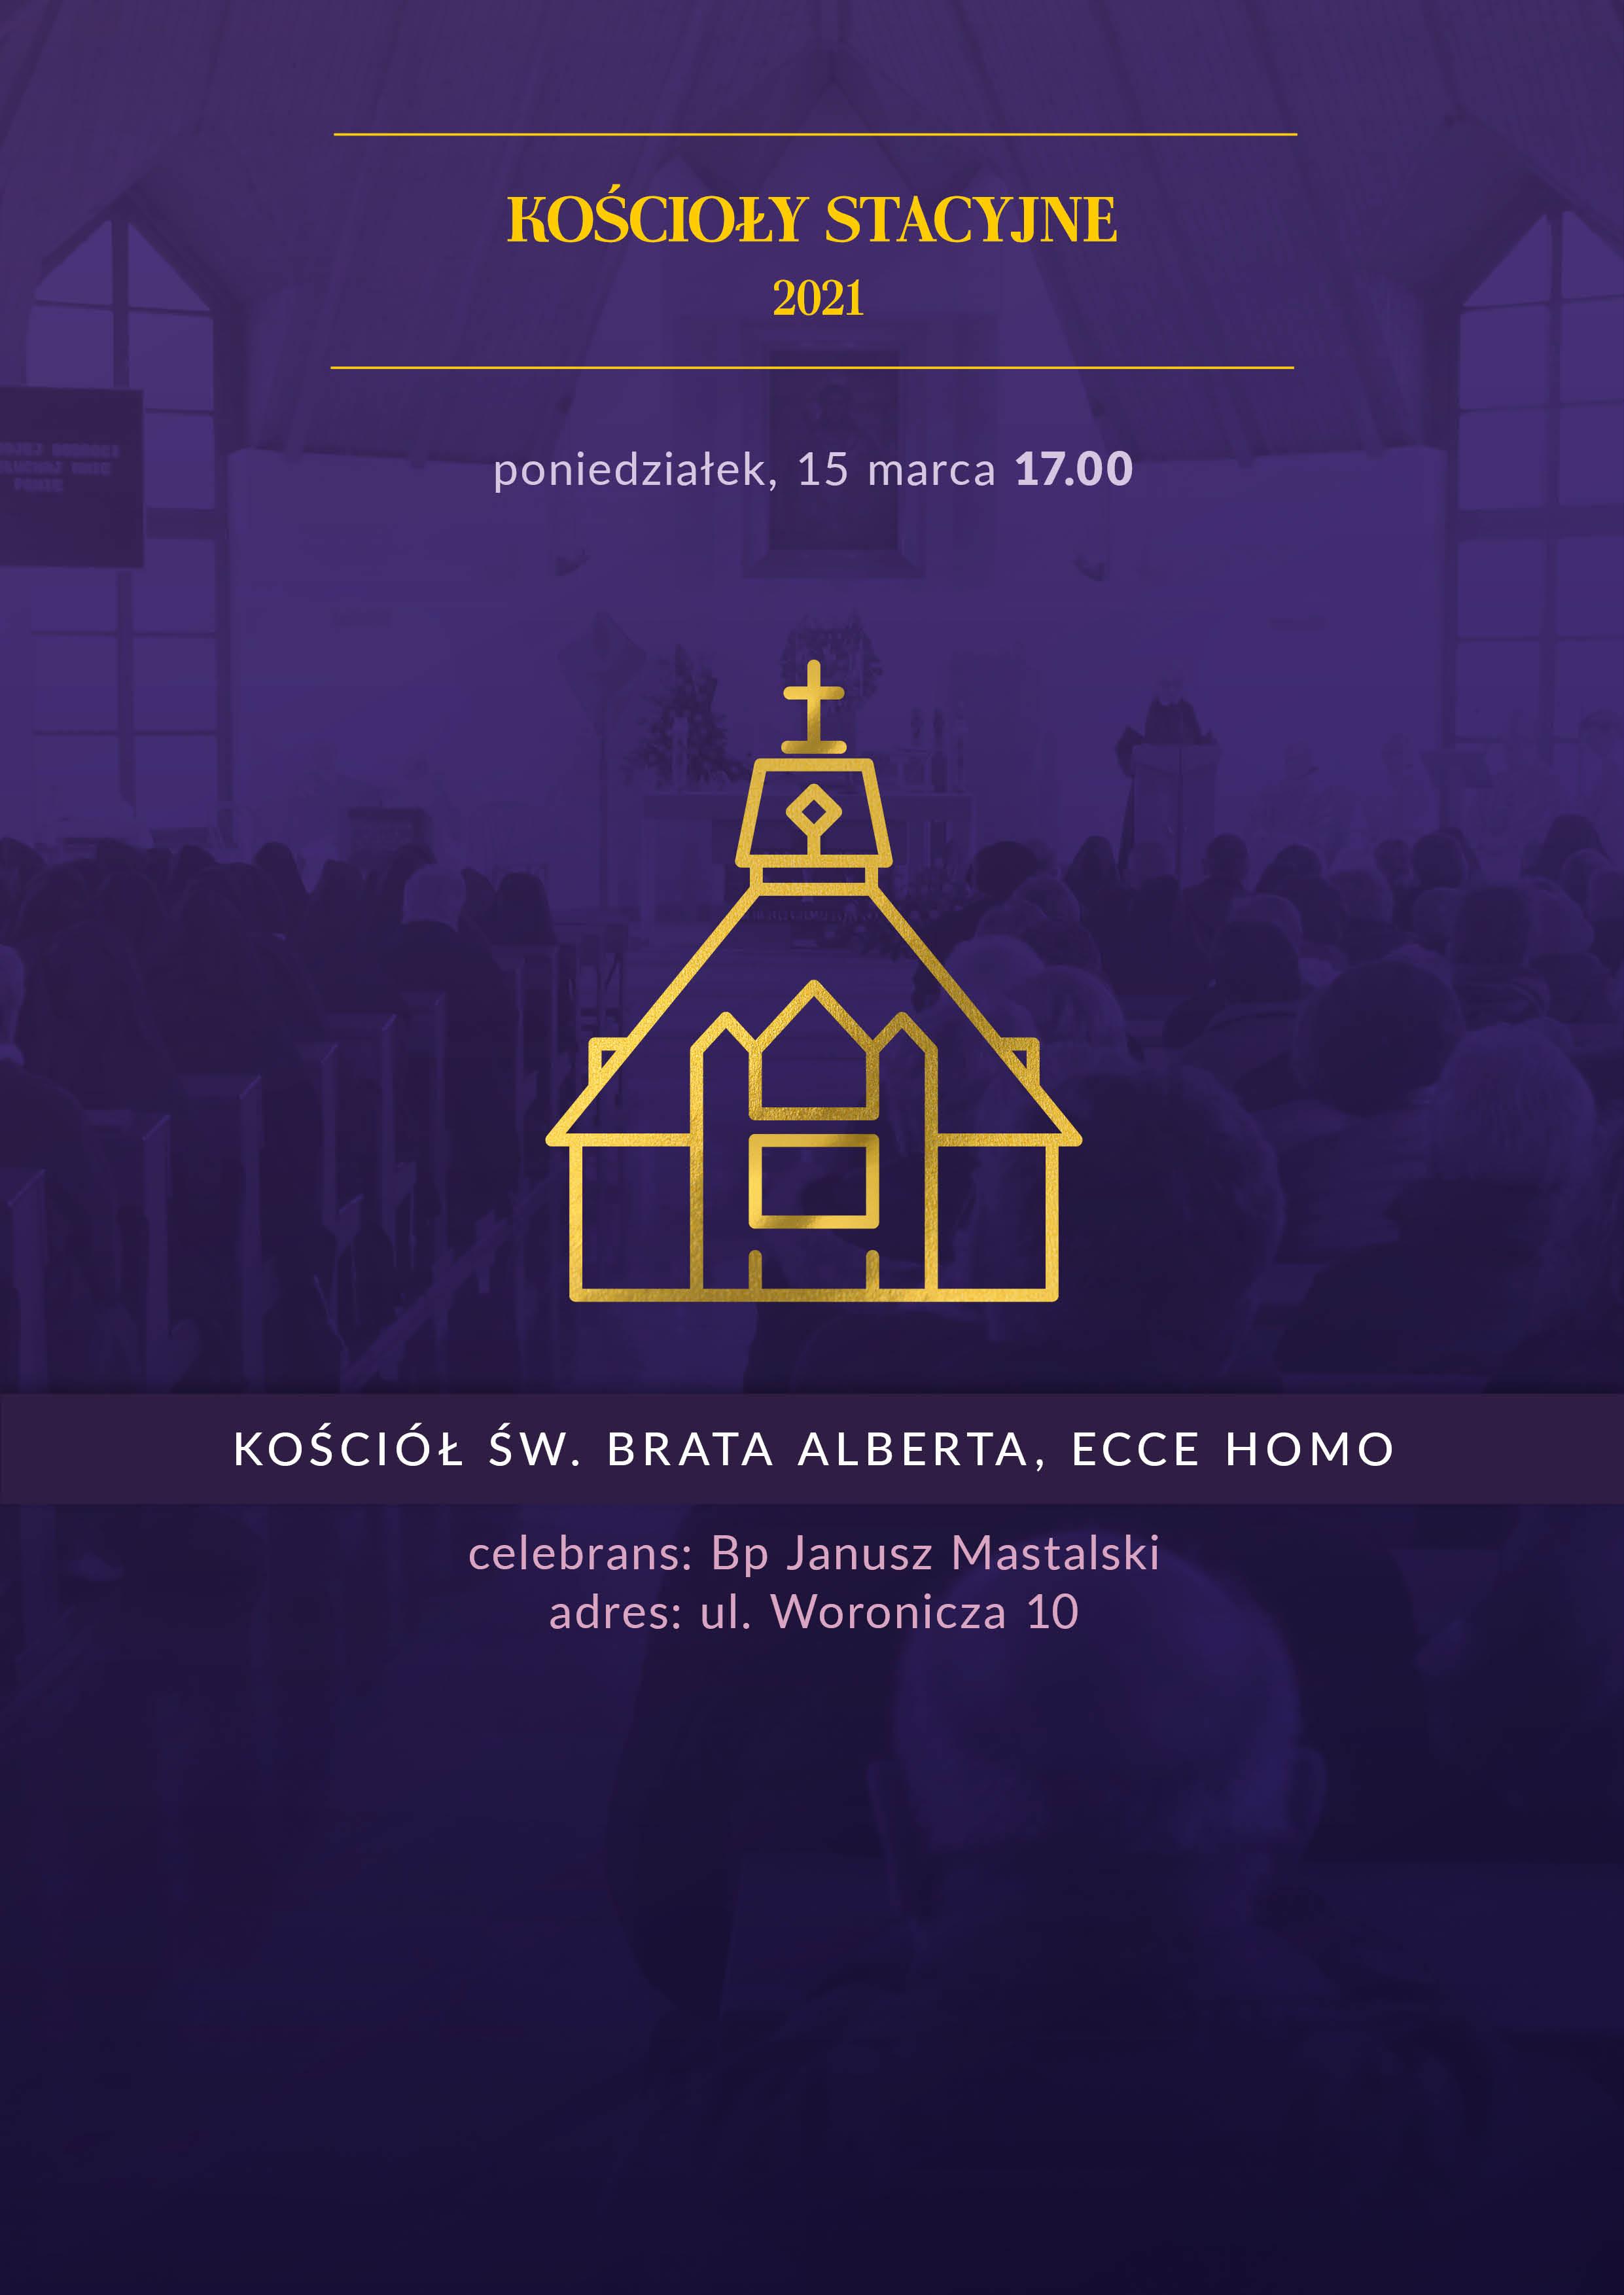 Liturgia stacyjna w Sanktuarium Ecce Homo św. Brata Alberta